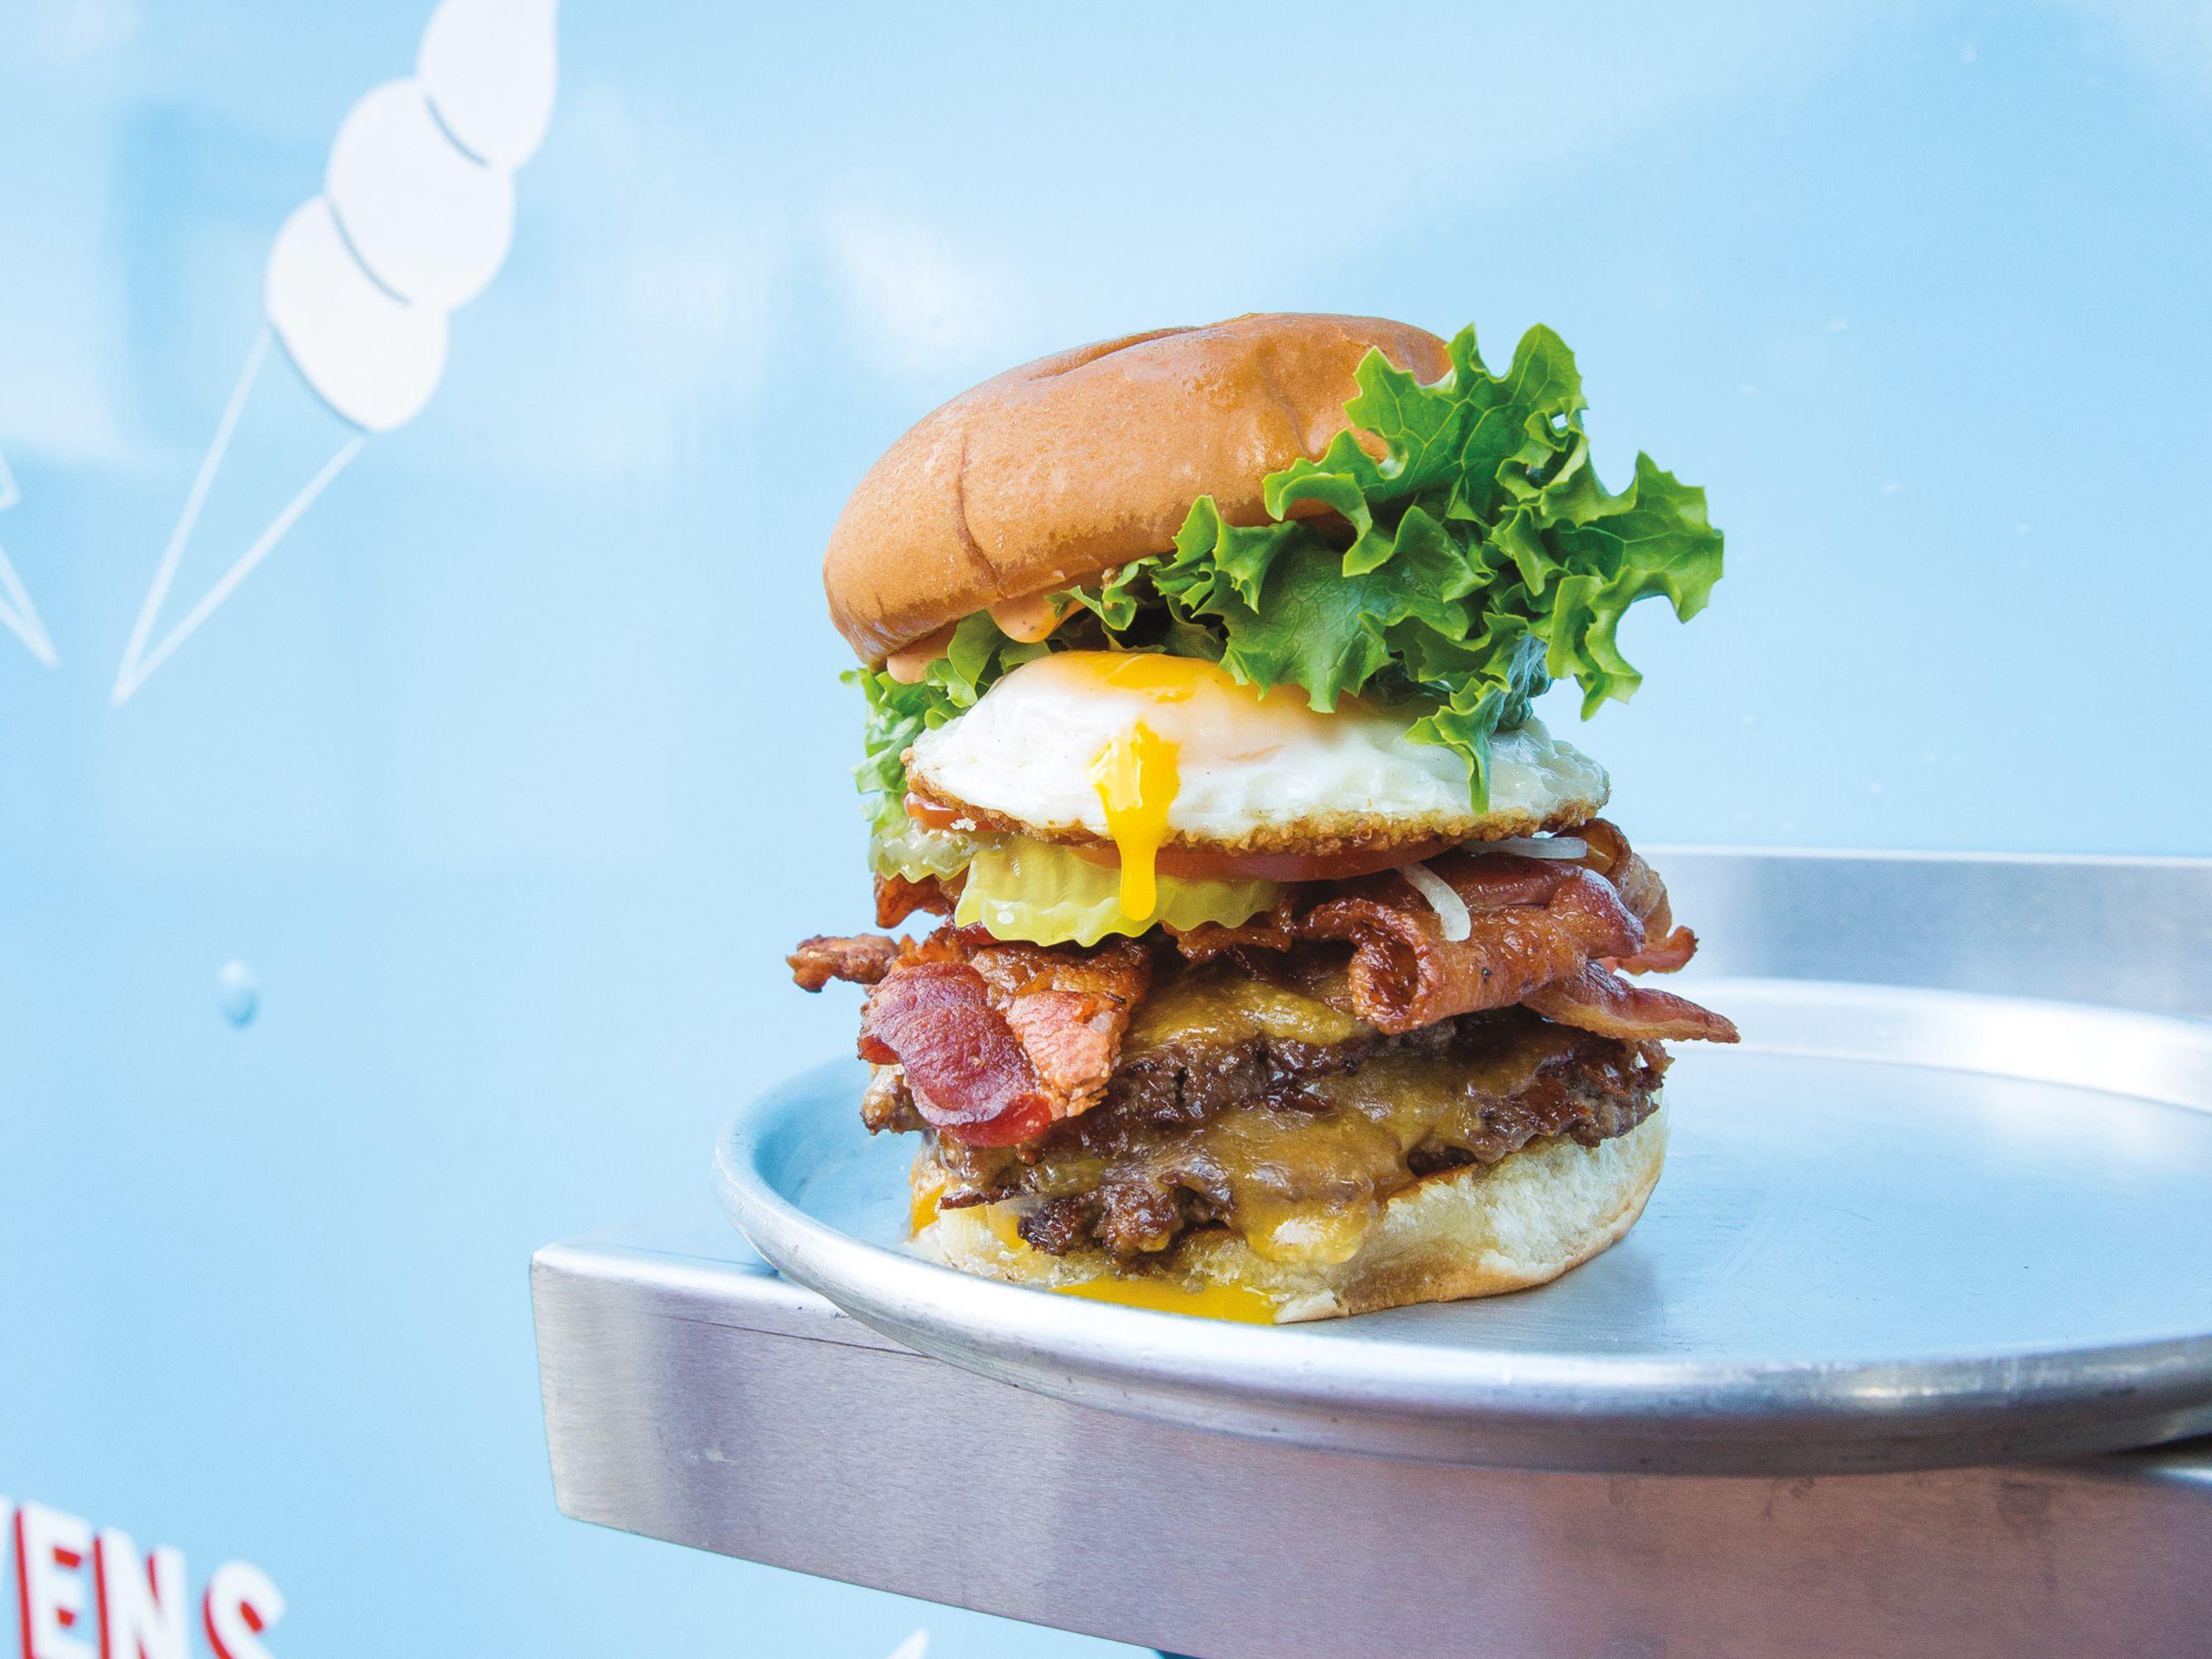 Pomo 0517 cheap eats burger stevens cheeseburger tyz9bd